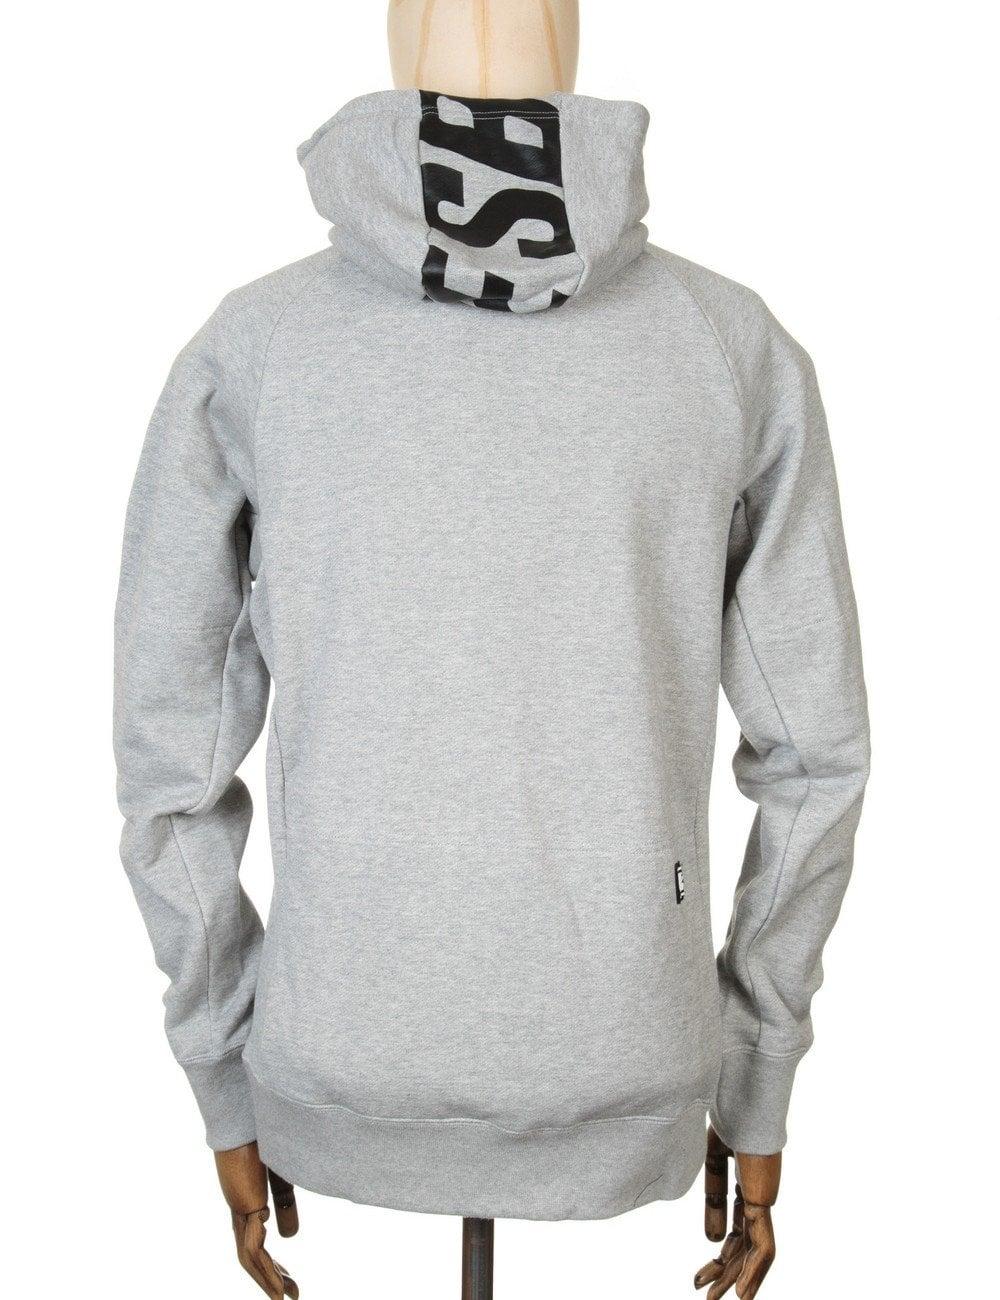 e0daae8bedb Nike SB Everett Graphic FZ Zip Hoody - Dark Grey Heather - Clothing ...